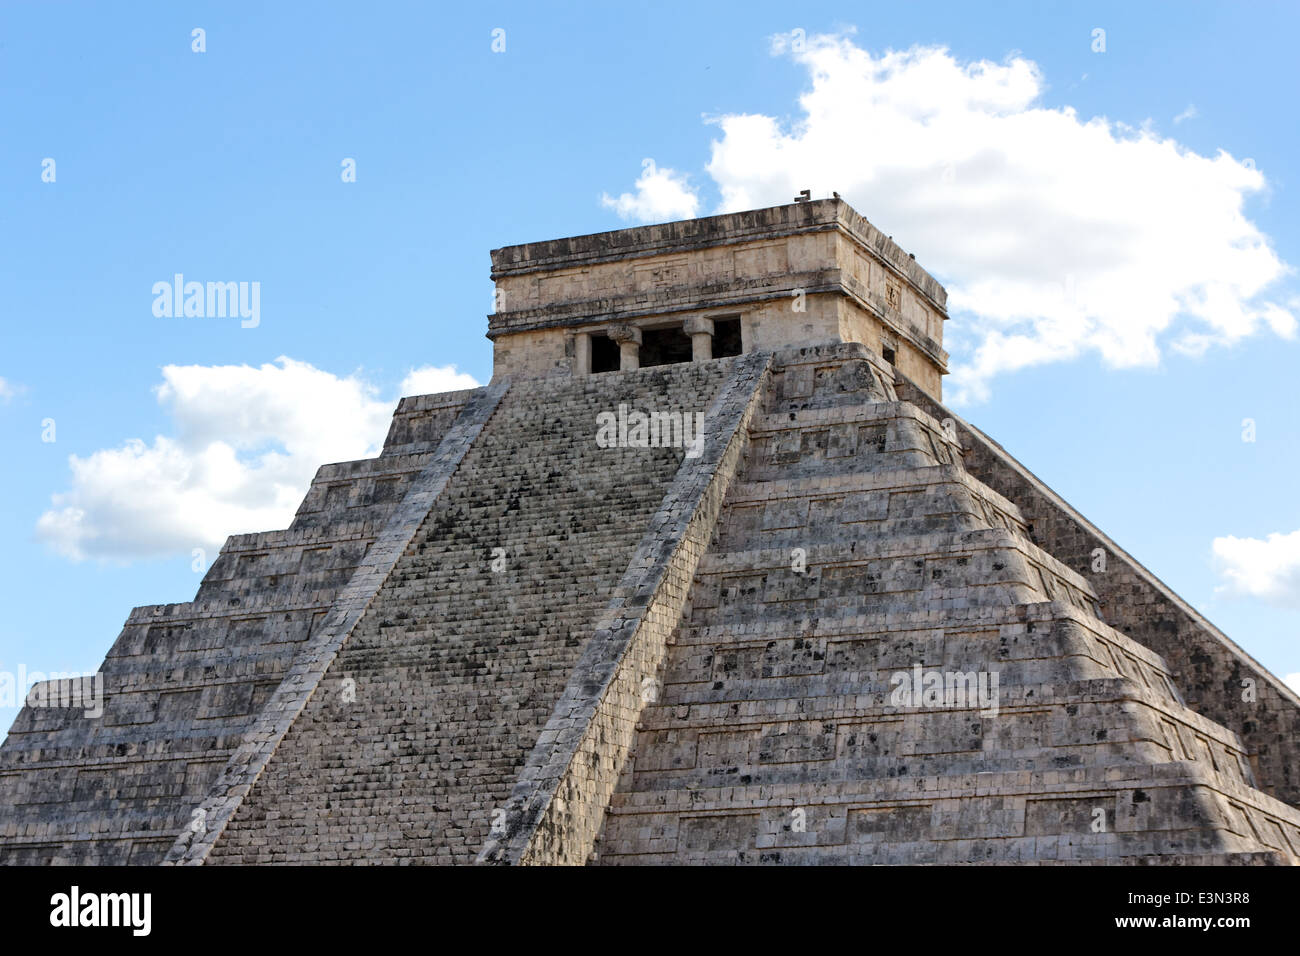 El Castillo, temple pyramid to Mayan serpent god Kukulkan, in Chichen Itza, Yucatan, Mexico. - Stock Image